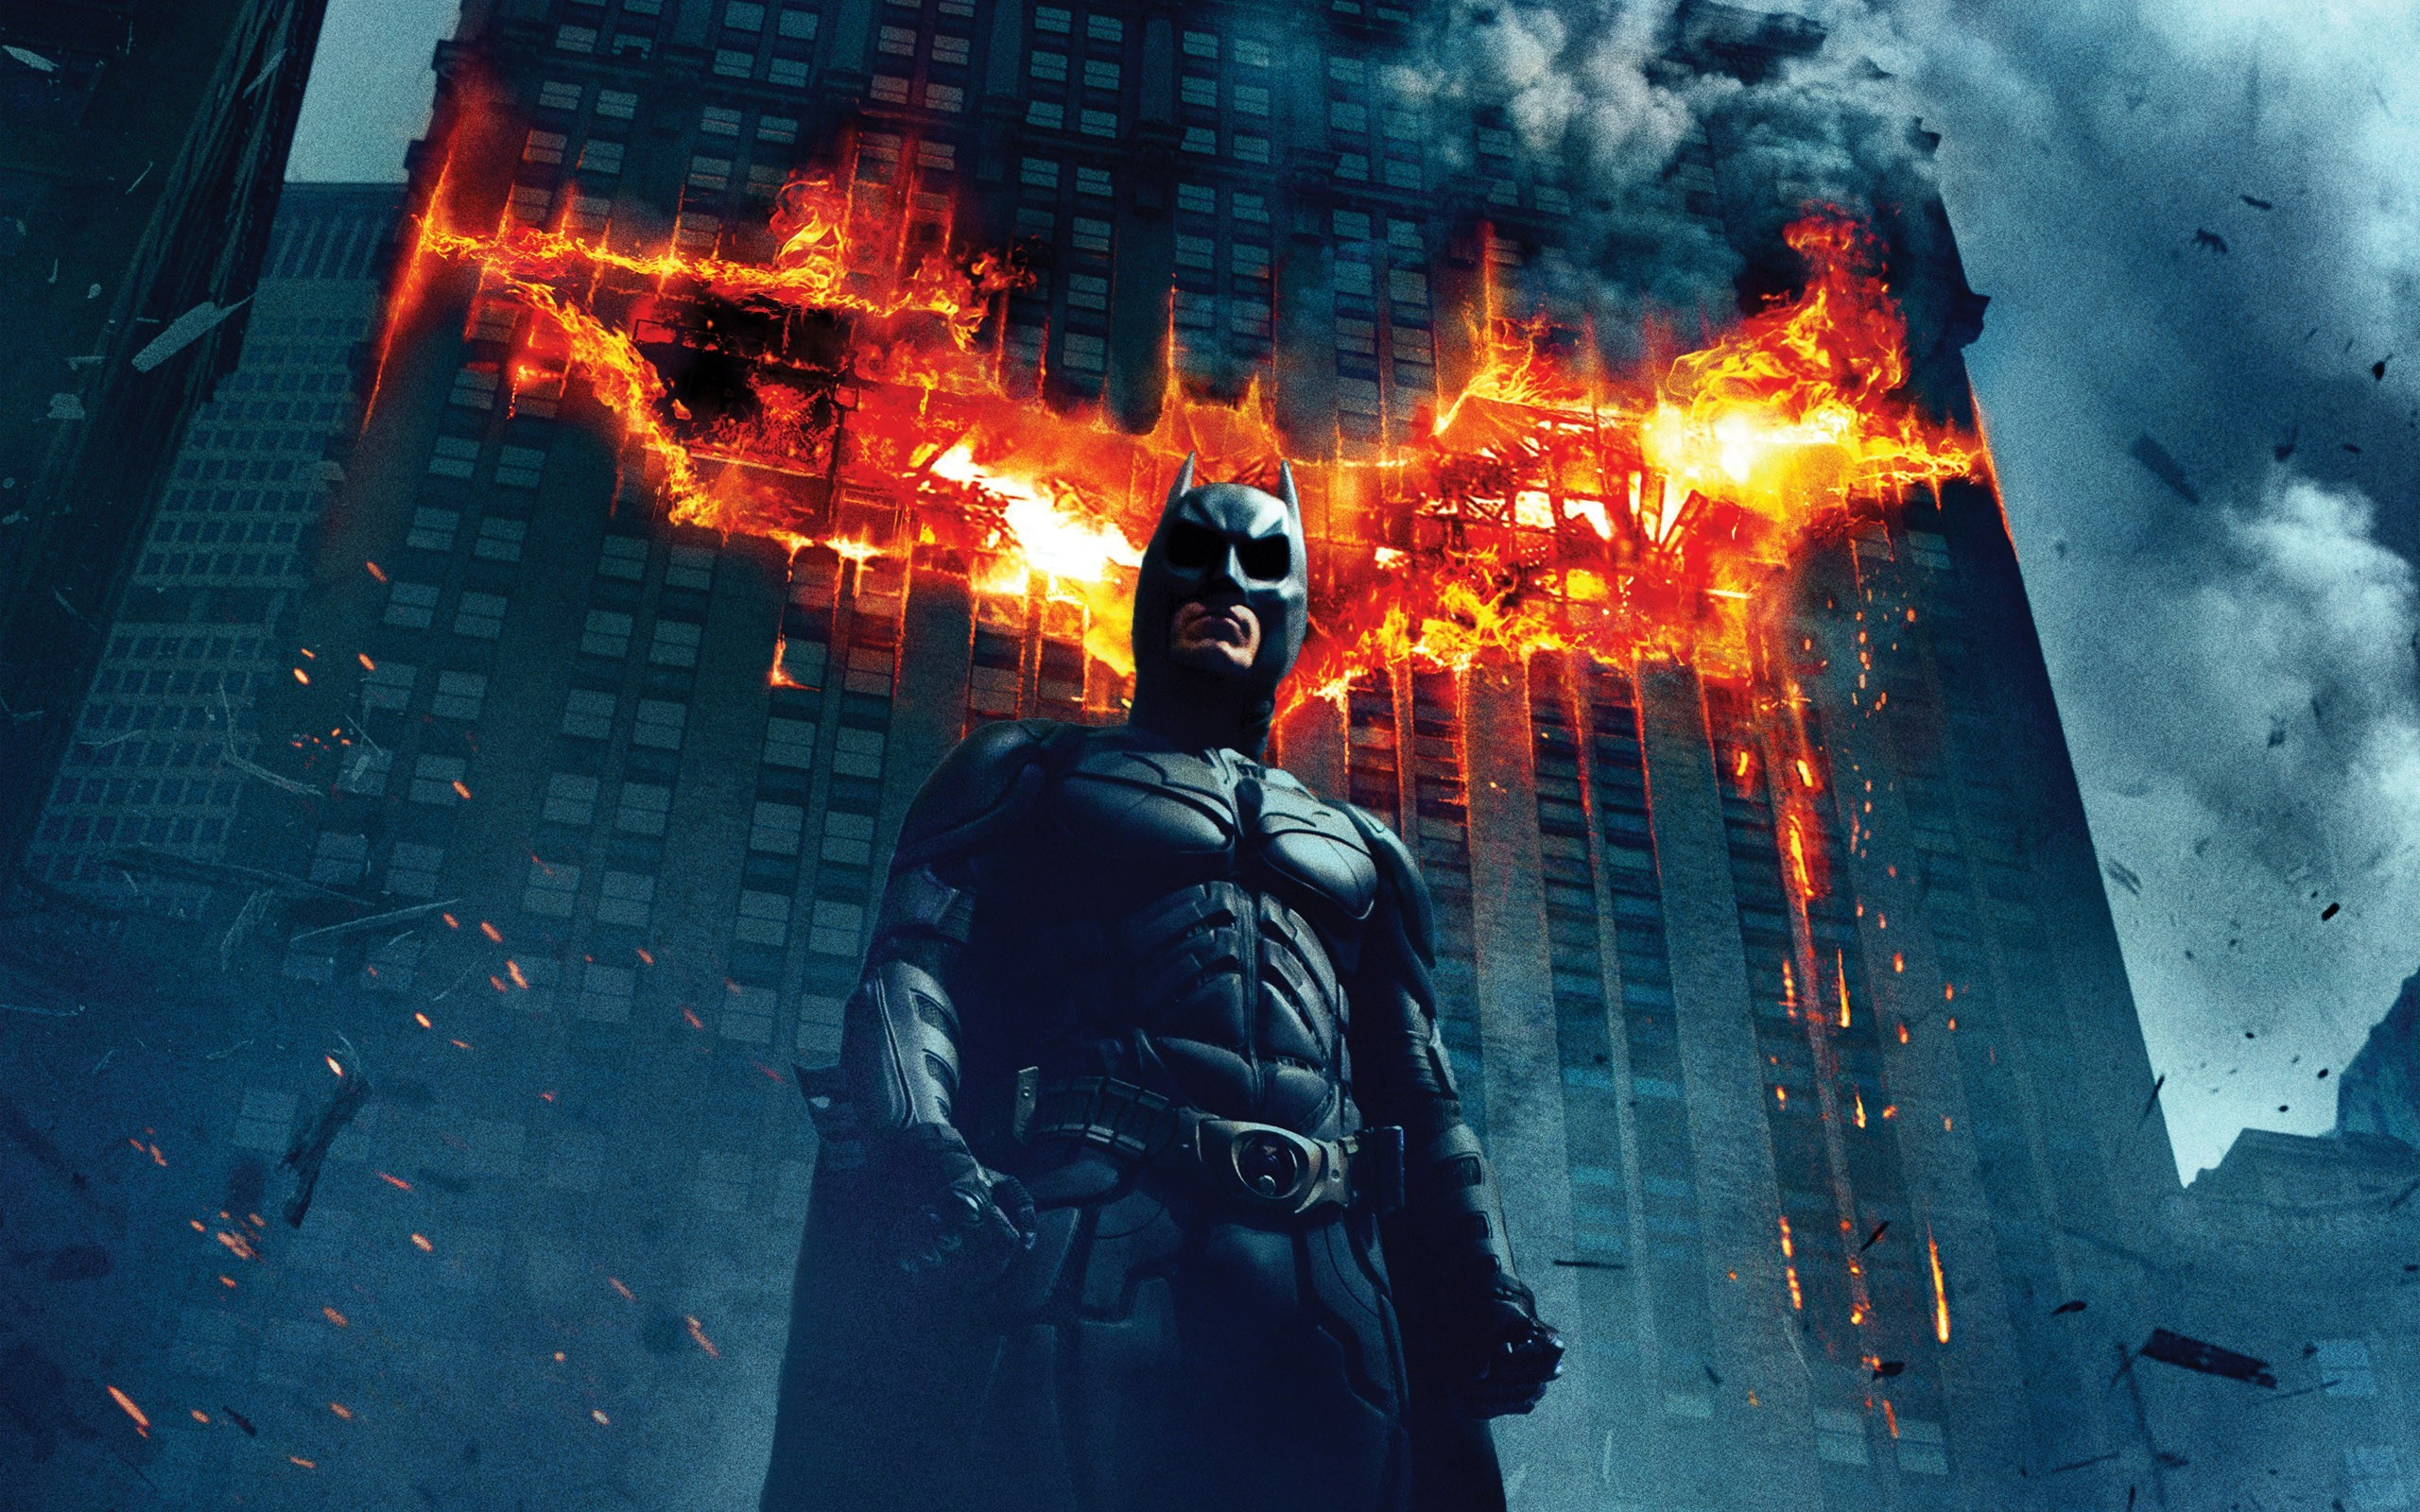 Batman The Dark Knight Wallpapers Wallpaper Cave